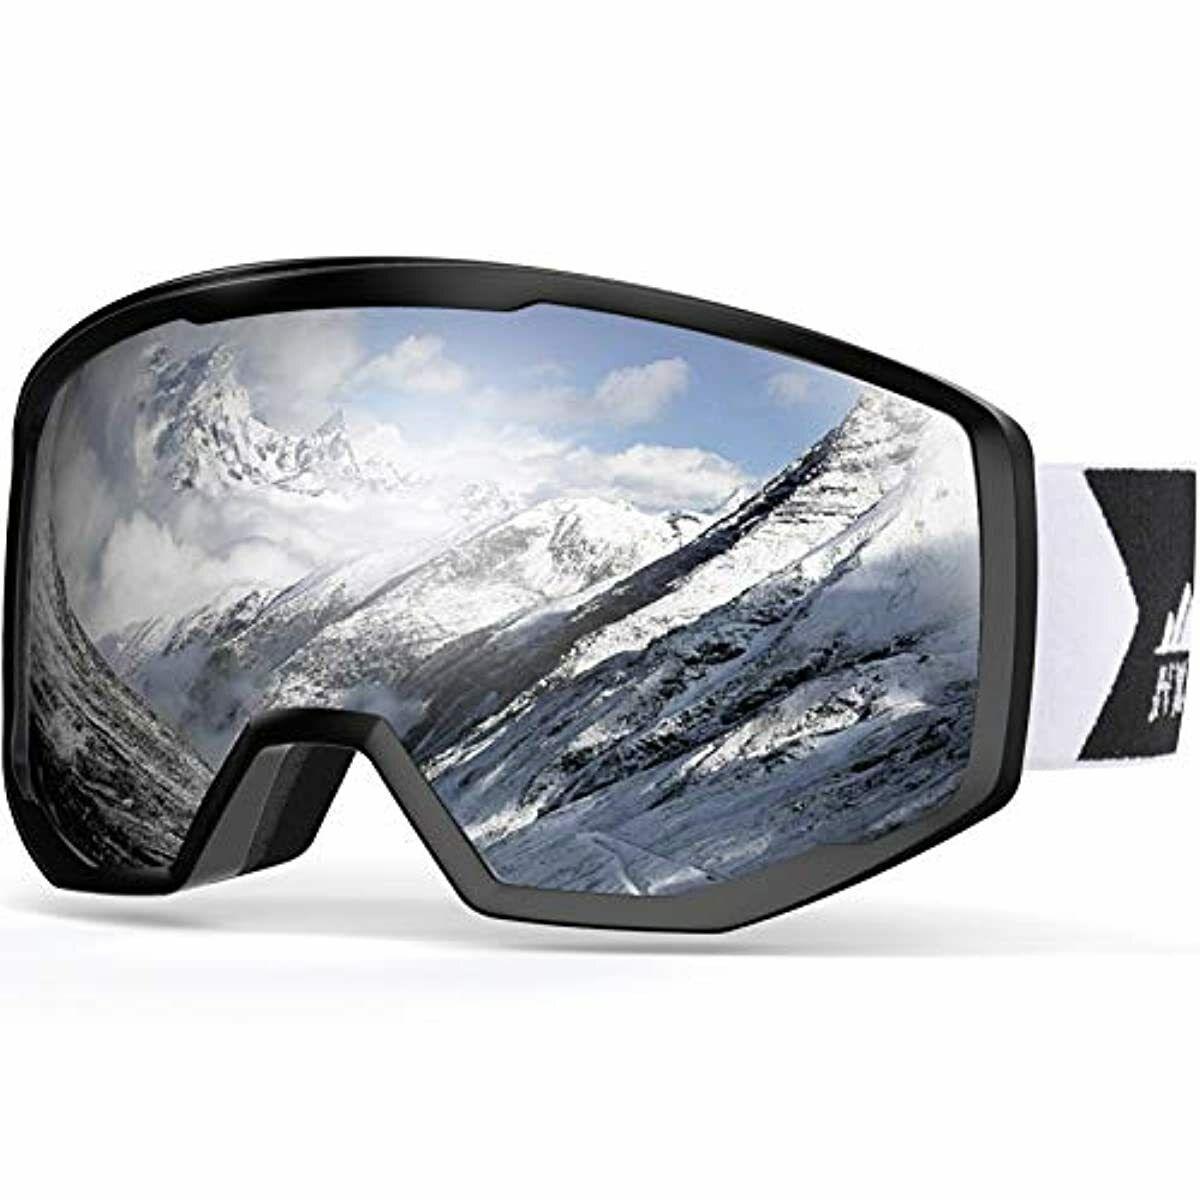 NXONE Ski Goggles for Men and Women, Anti-Fog Over Glasses S